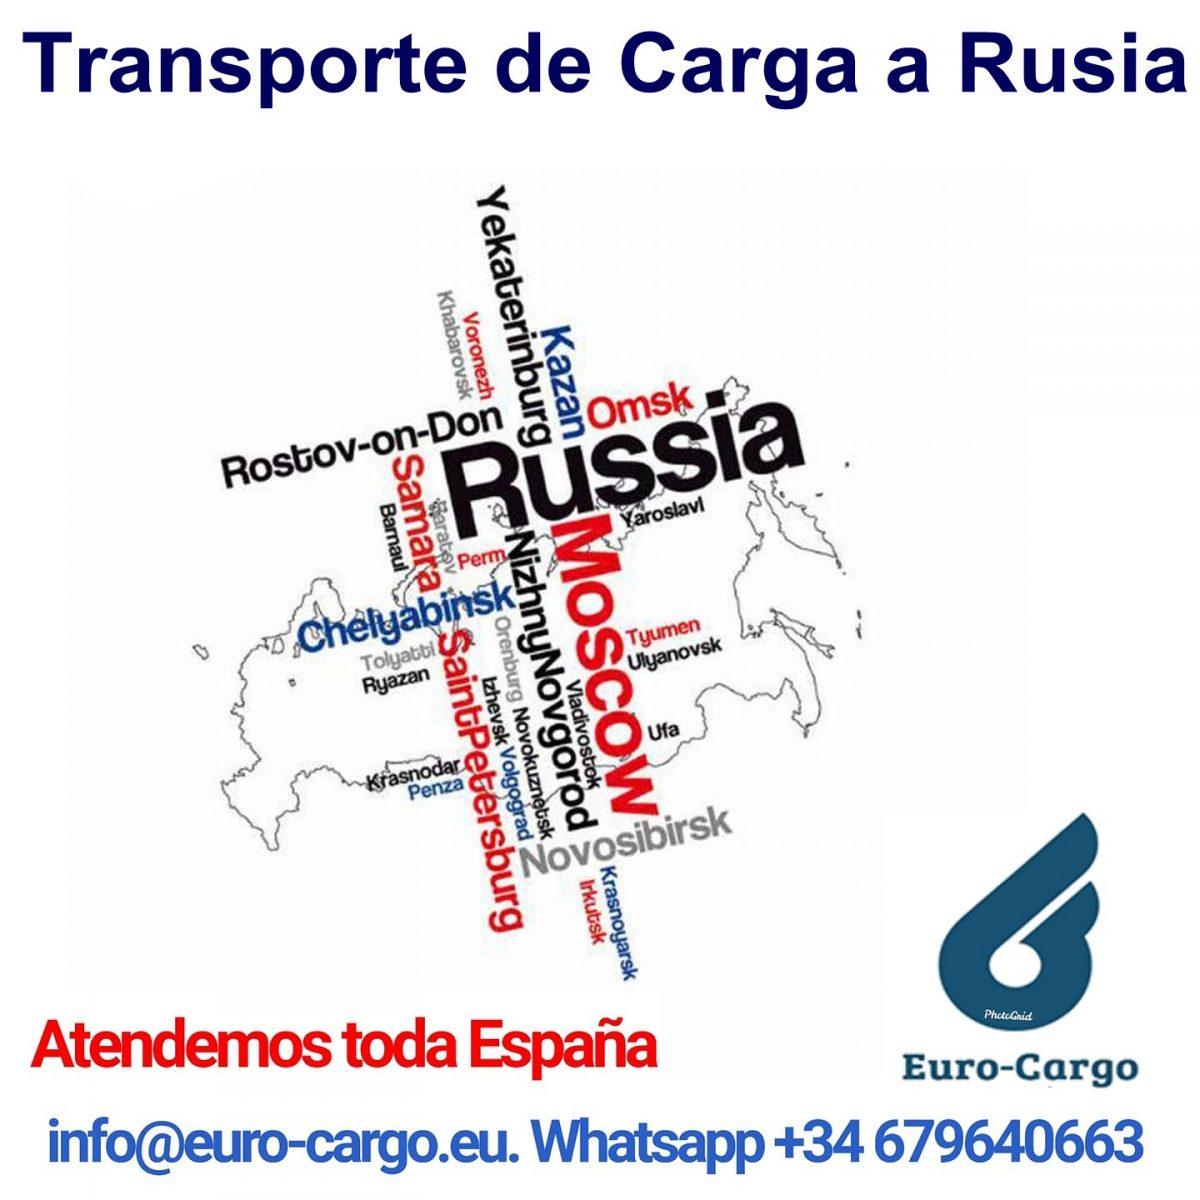 Nuevos-destinos-1200x1200.jpg